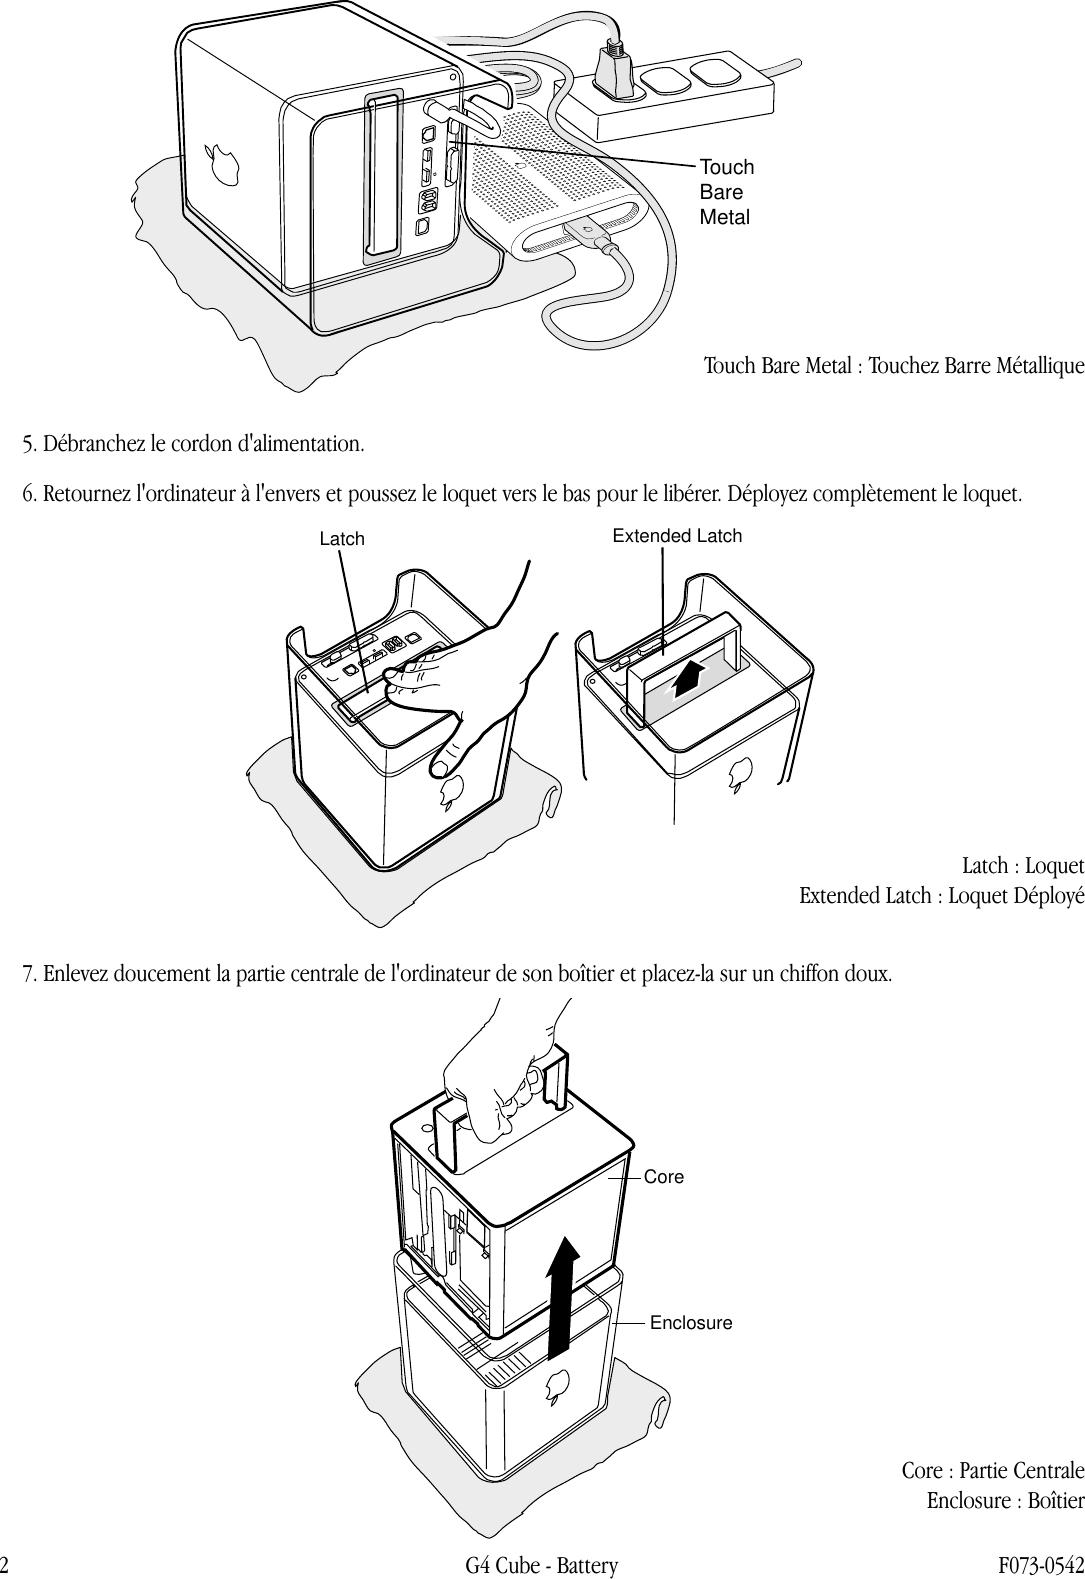 Apple Power Mac G4(Cube) Battery User Manual Power Mac G4